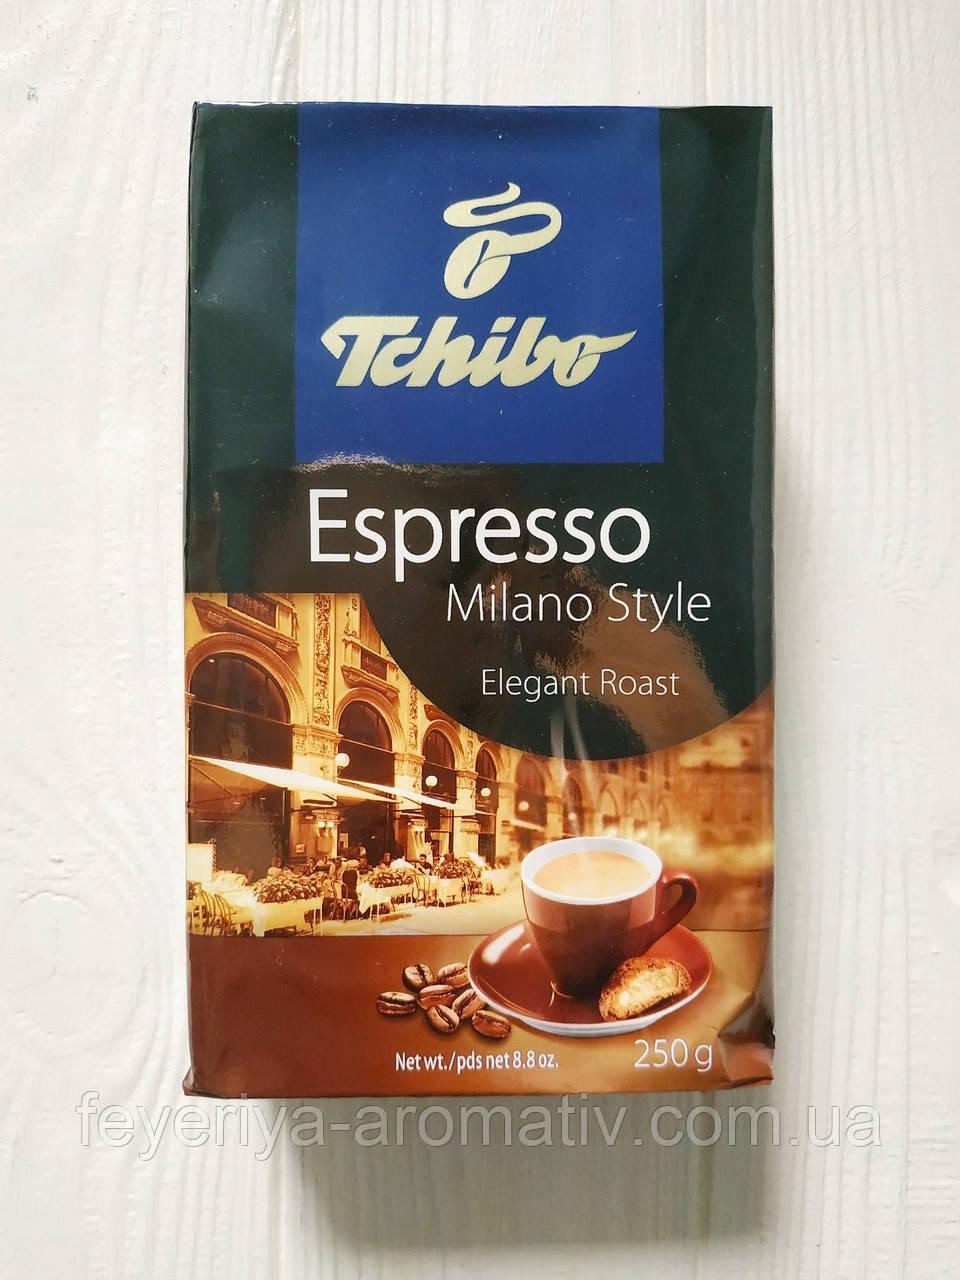 Кофе молотый Tchibo Espresso Milano Style Elegant Roast 250гр. (Германия)